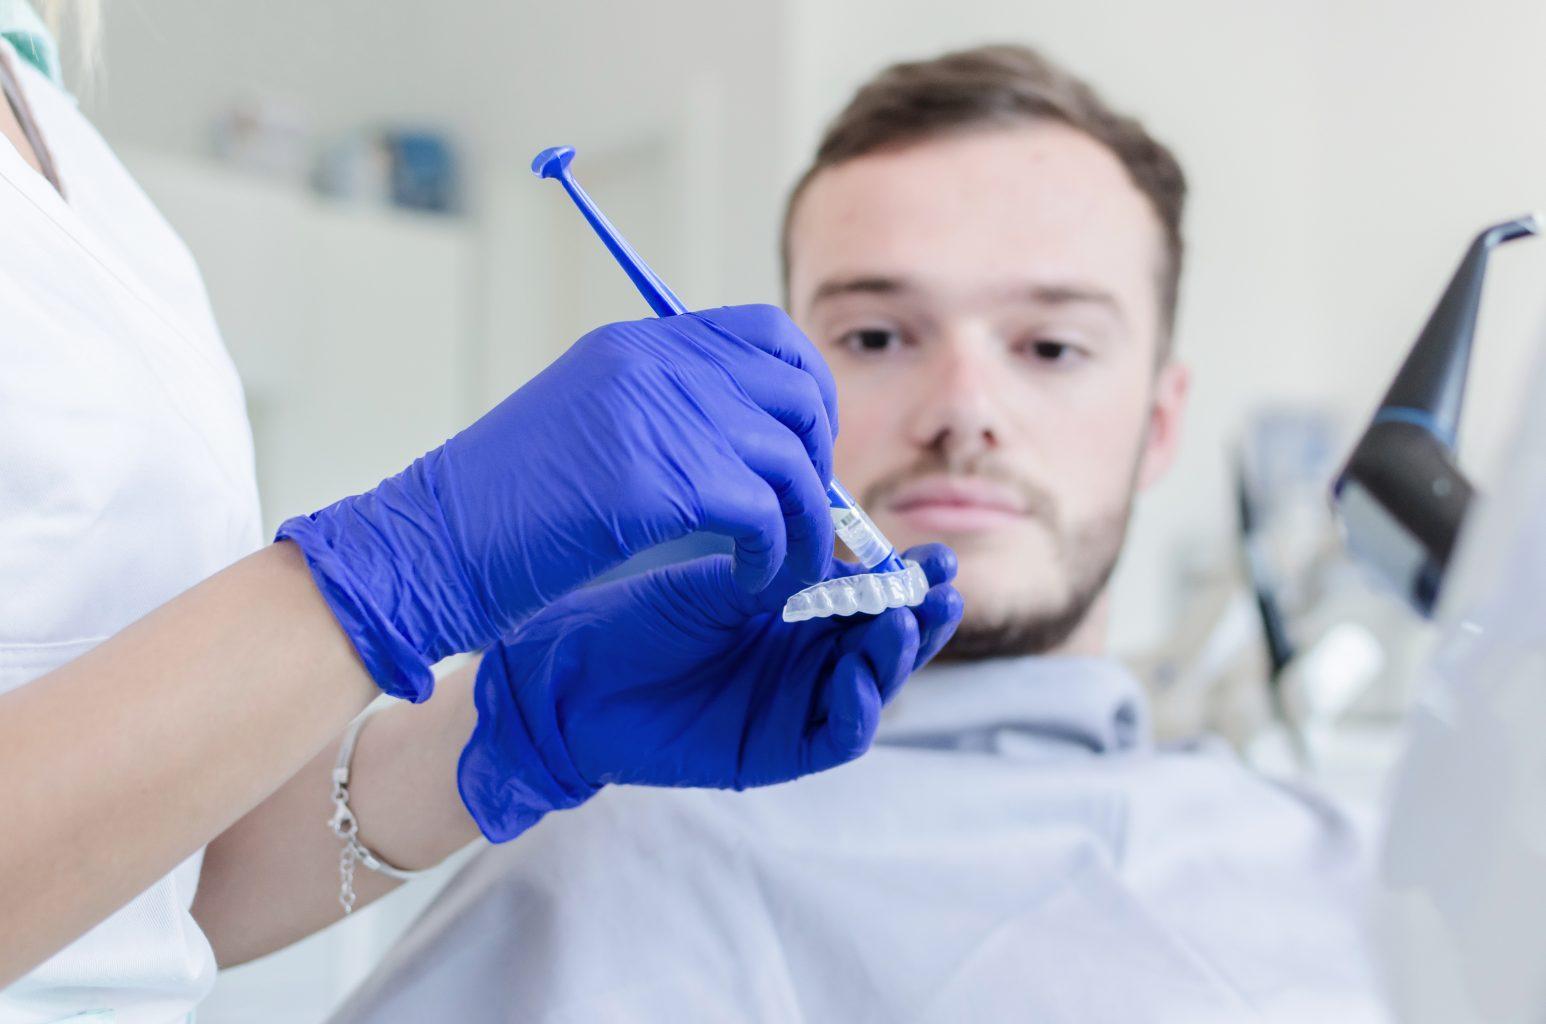 Man Whitening Teeth In Dental Office